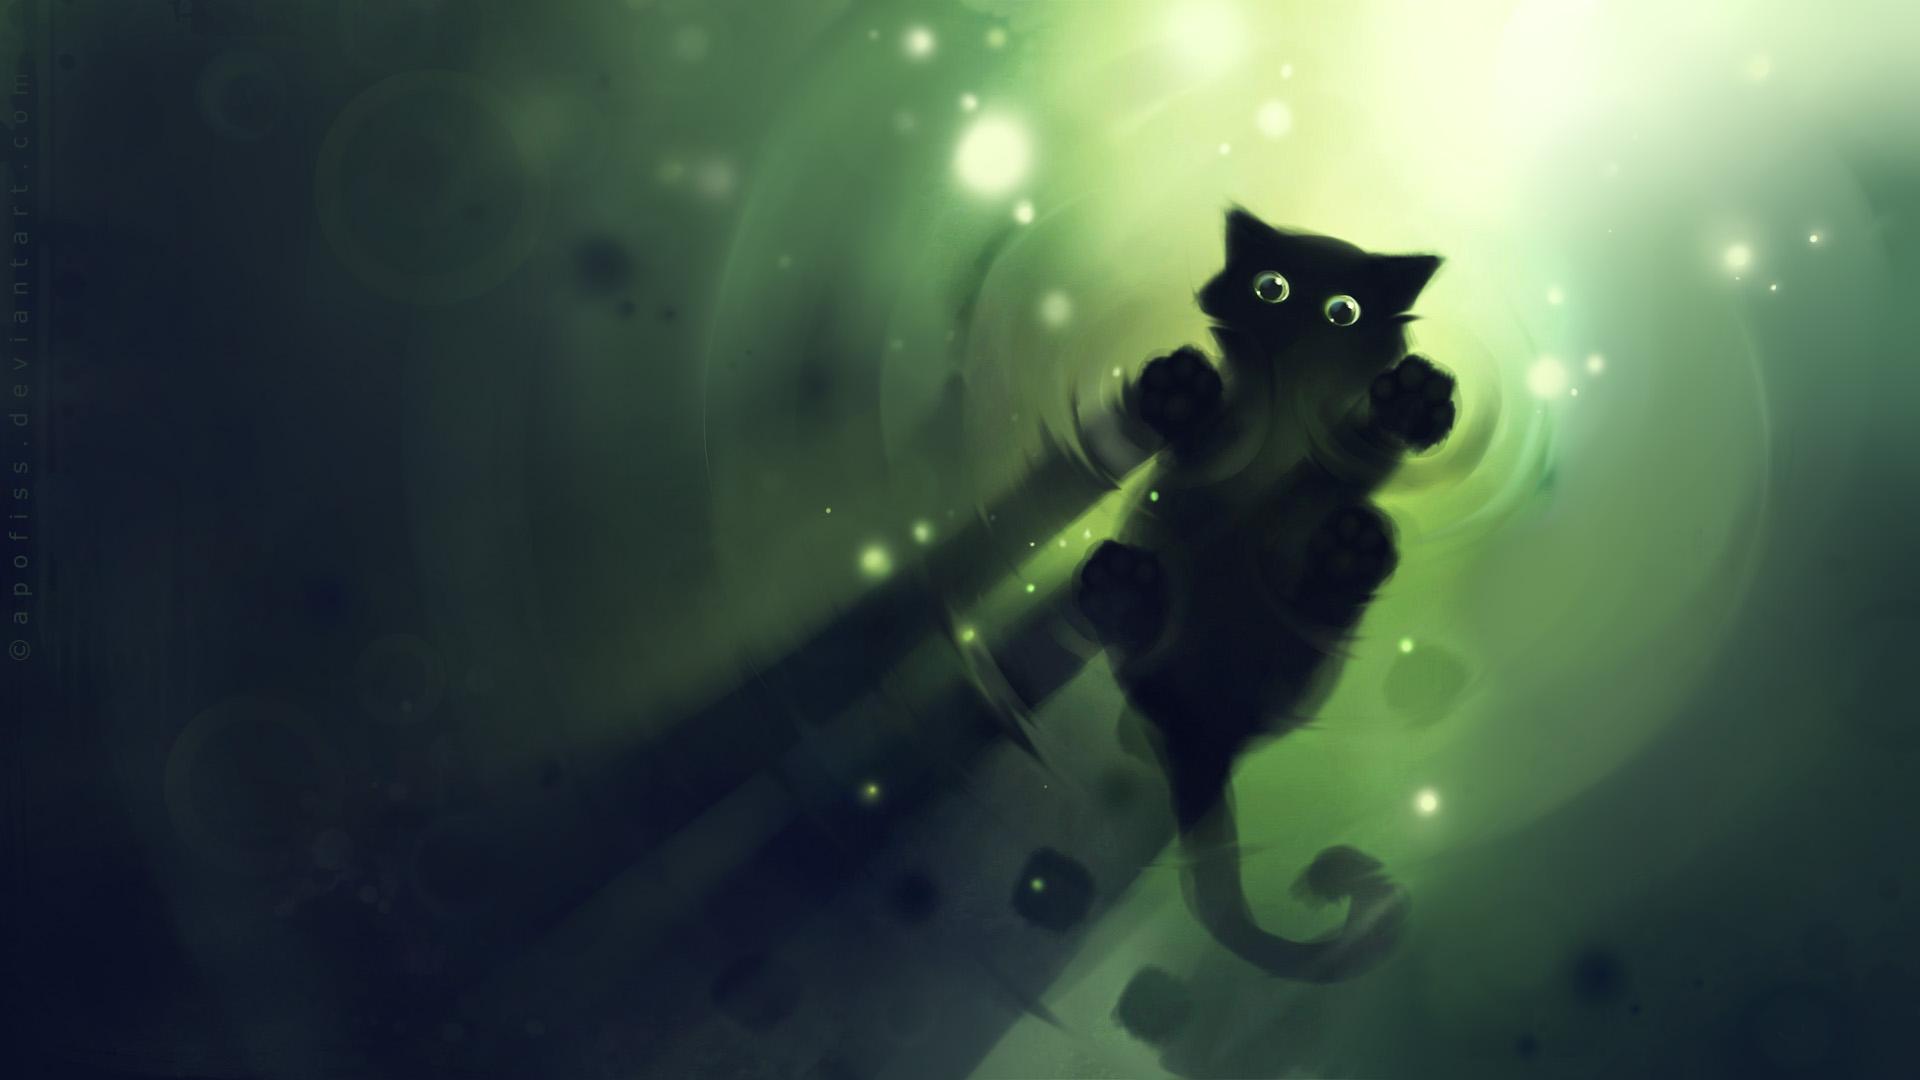 Black Cat Hd Wallpaper Download Hd Wallpapers 1920x1080